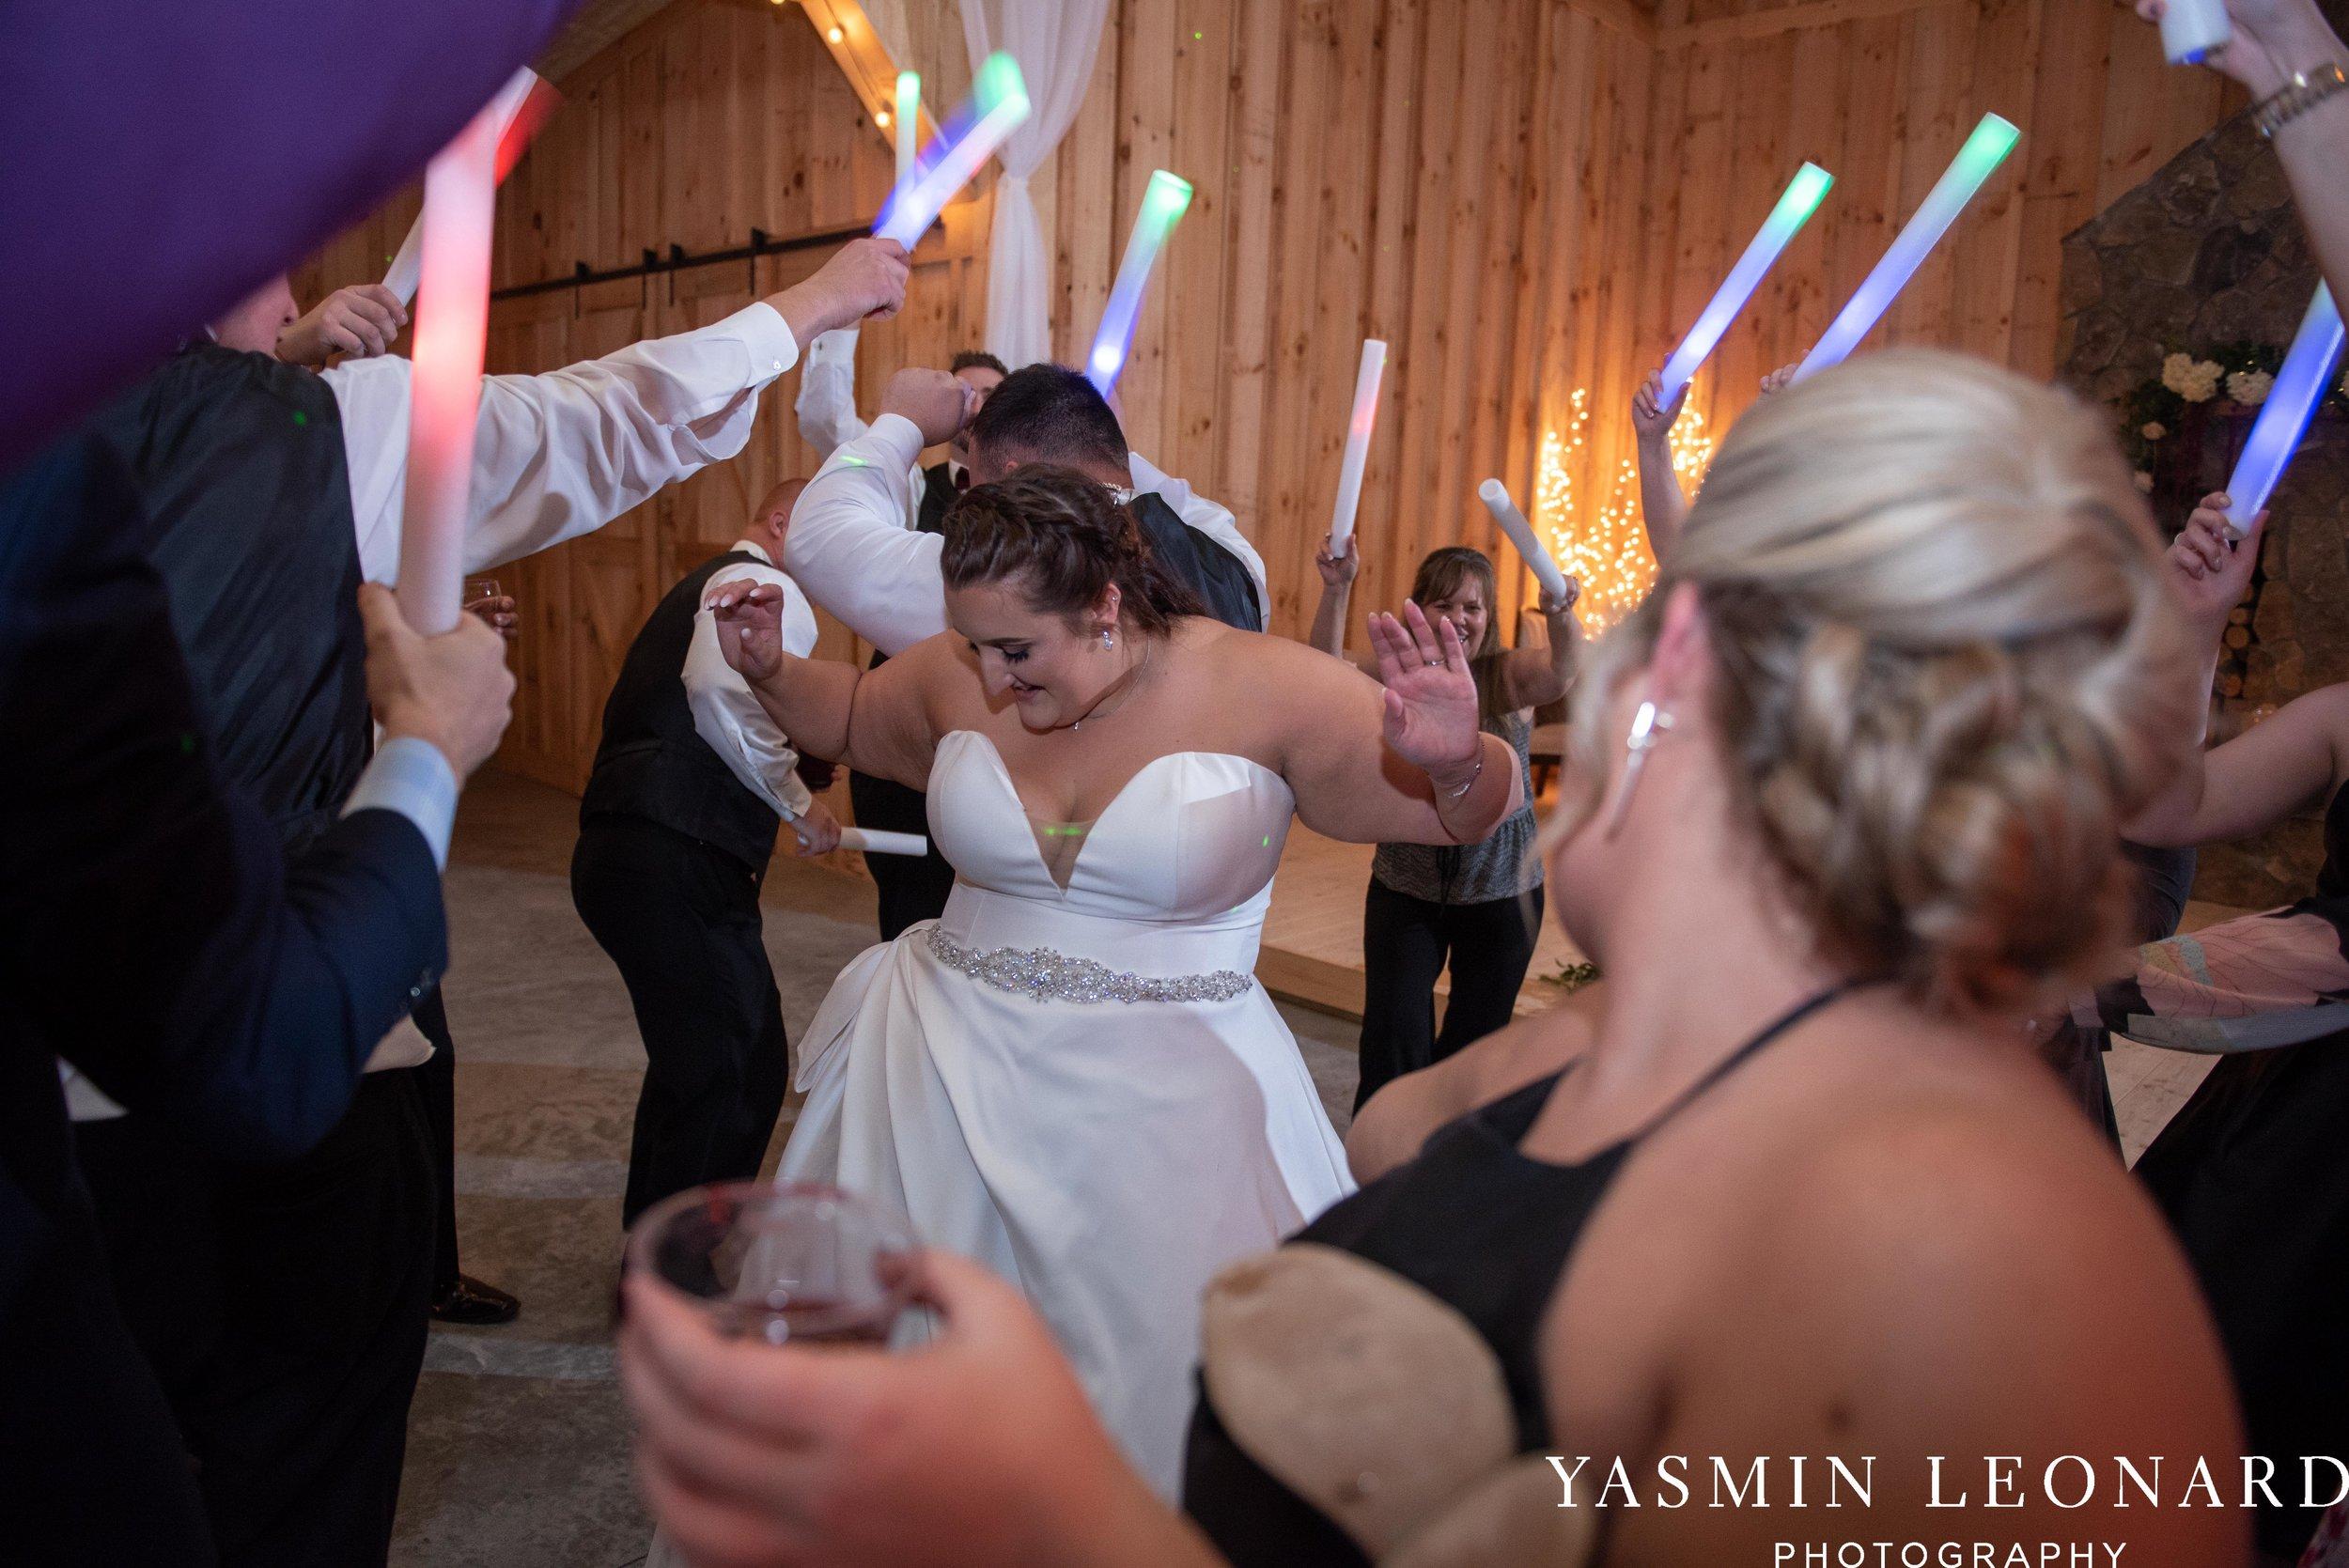 Wesley Memorial United Methodist Church - Old Homeplace Winery - High Point Weddings - High Point Wedding Photographer - NC Weddings - NC Barn Venue - Yasmin Leonard Photography-74.jpg